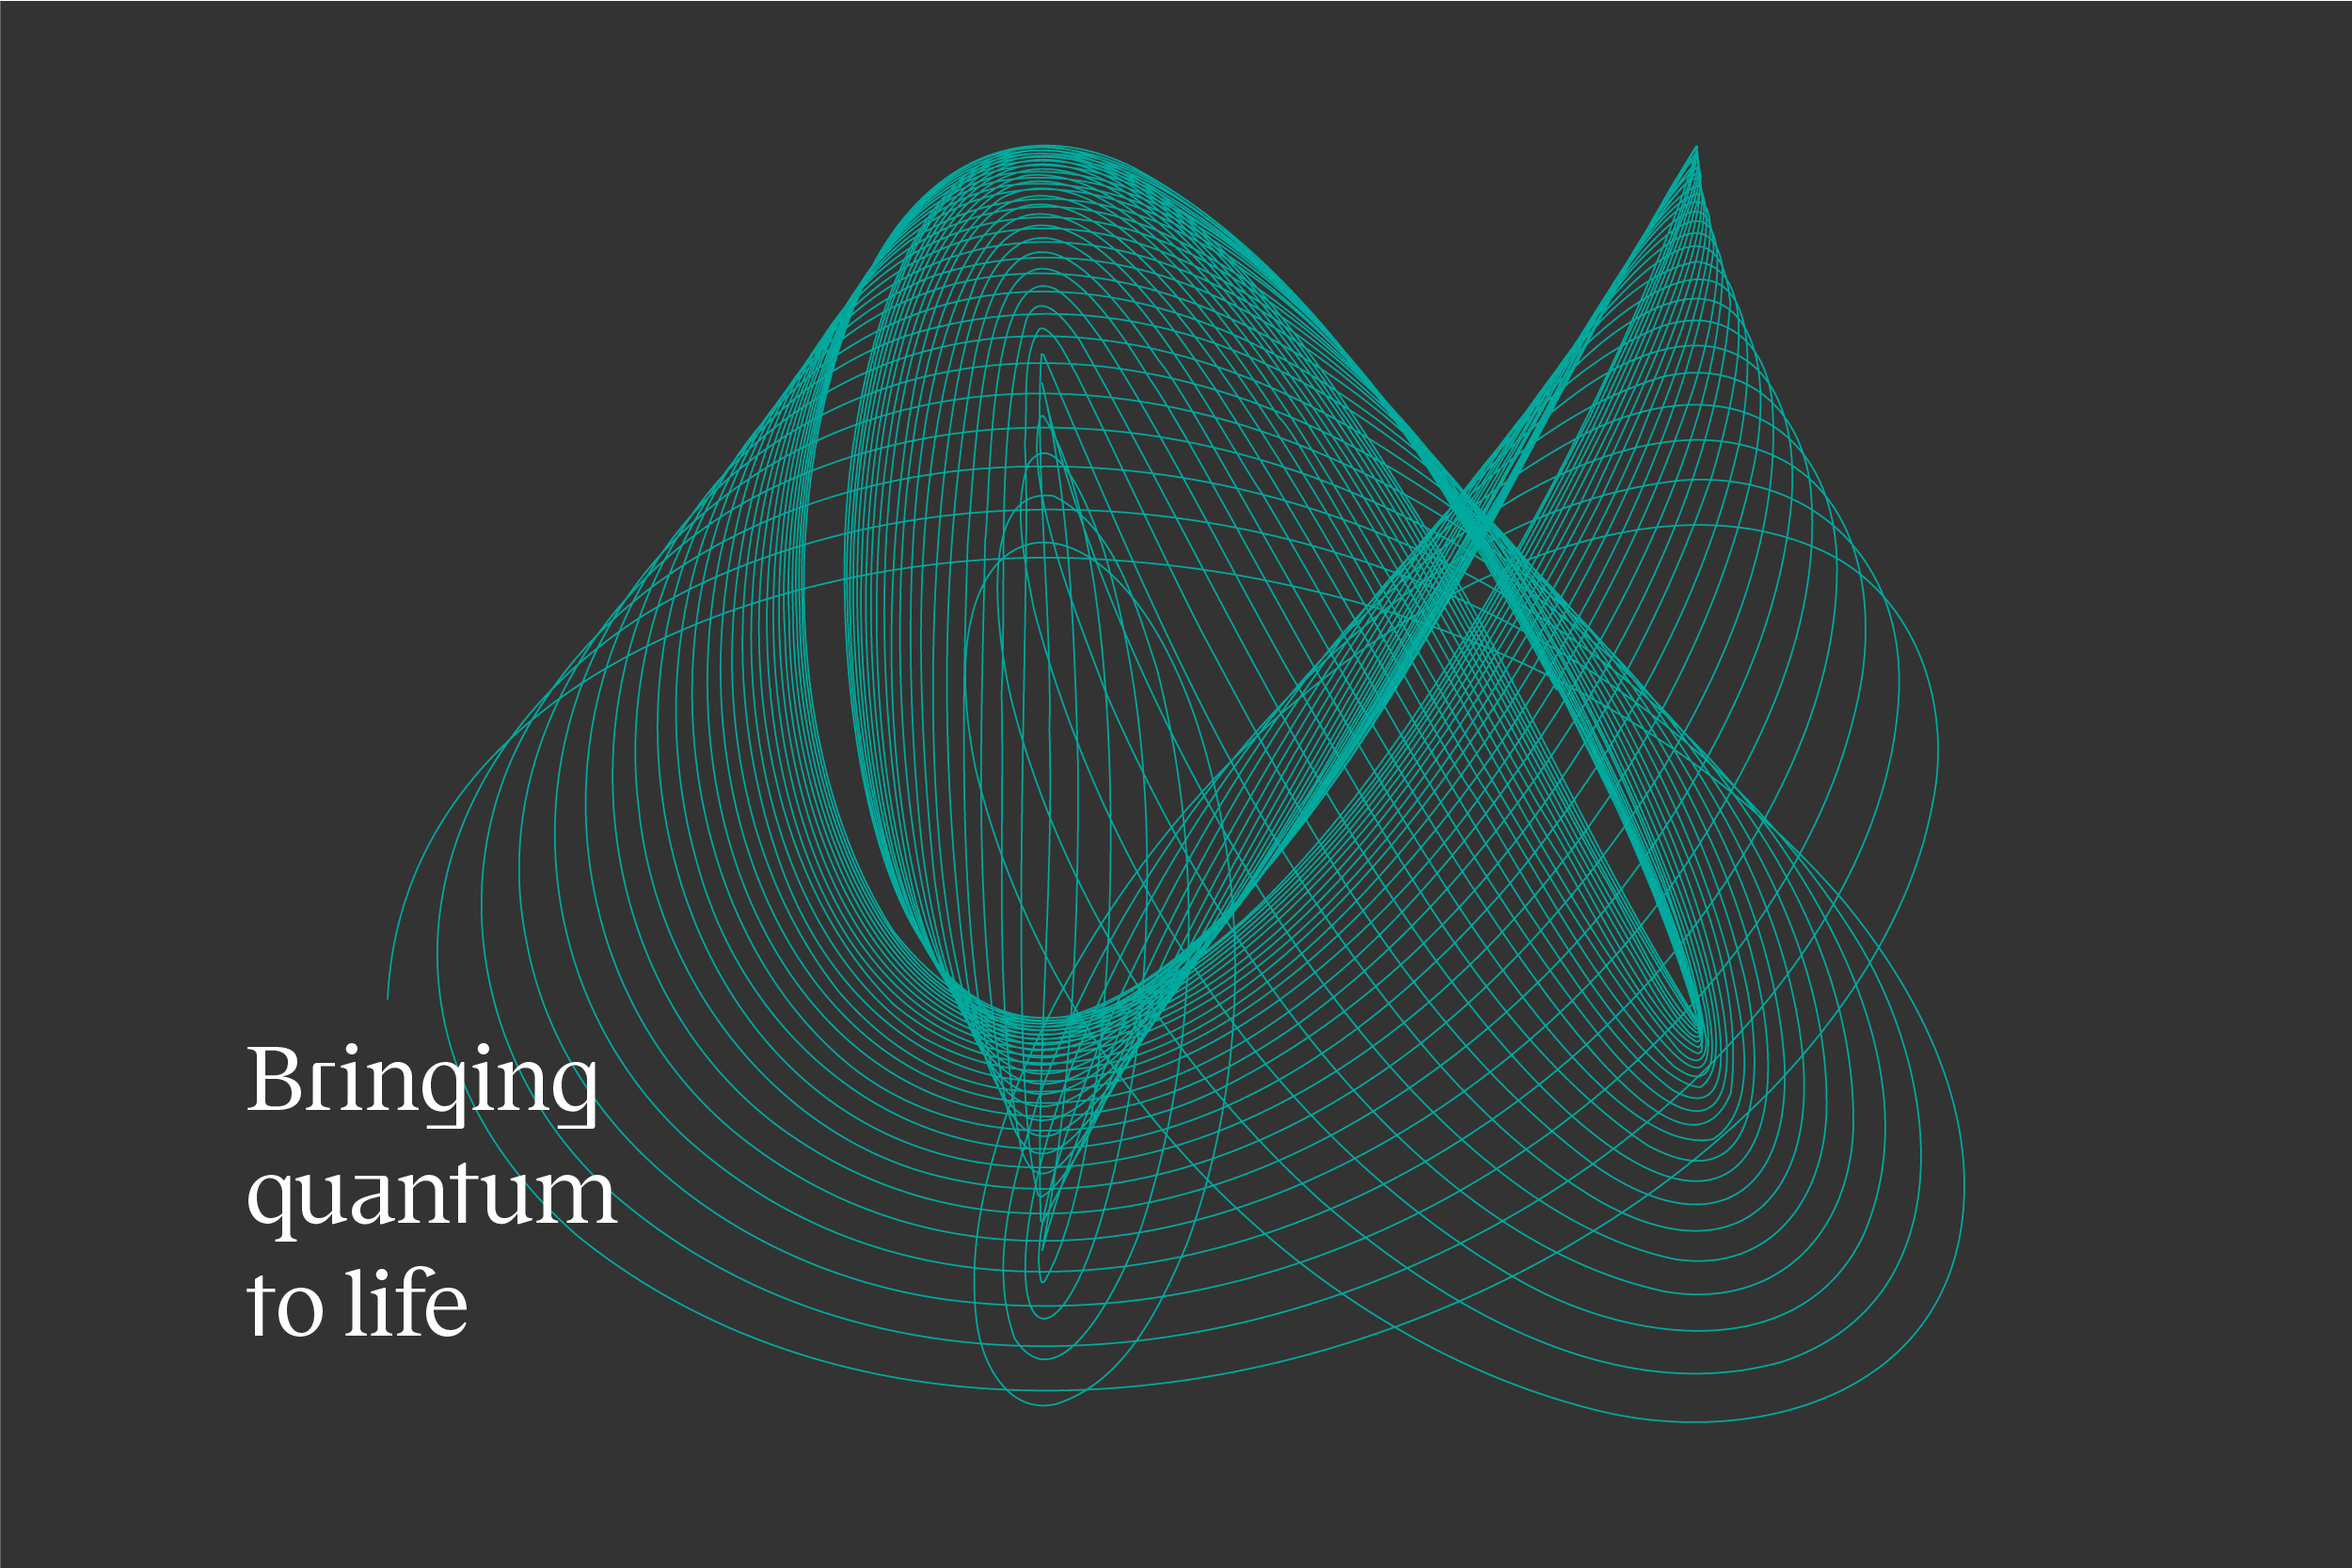 Tagline_Algorithmiq-design-quantum-technology-startup